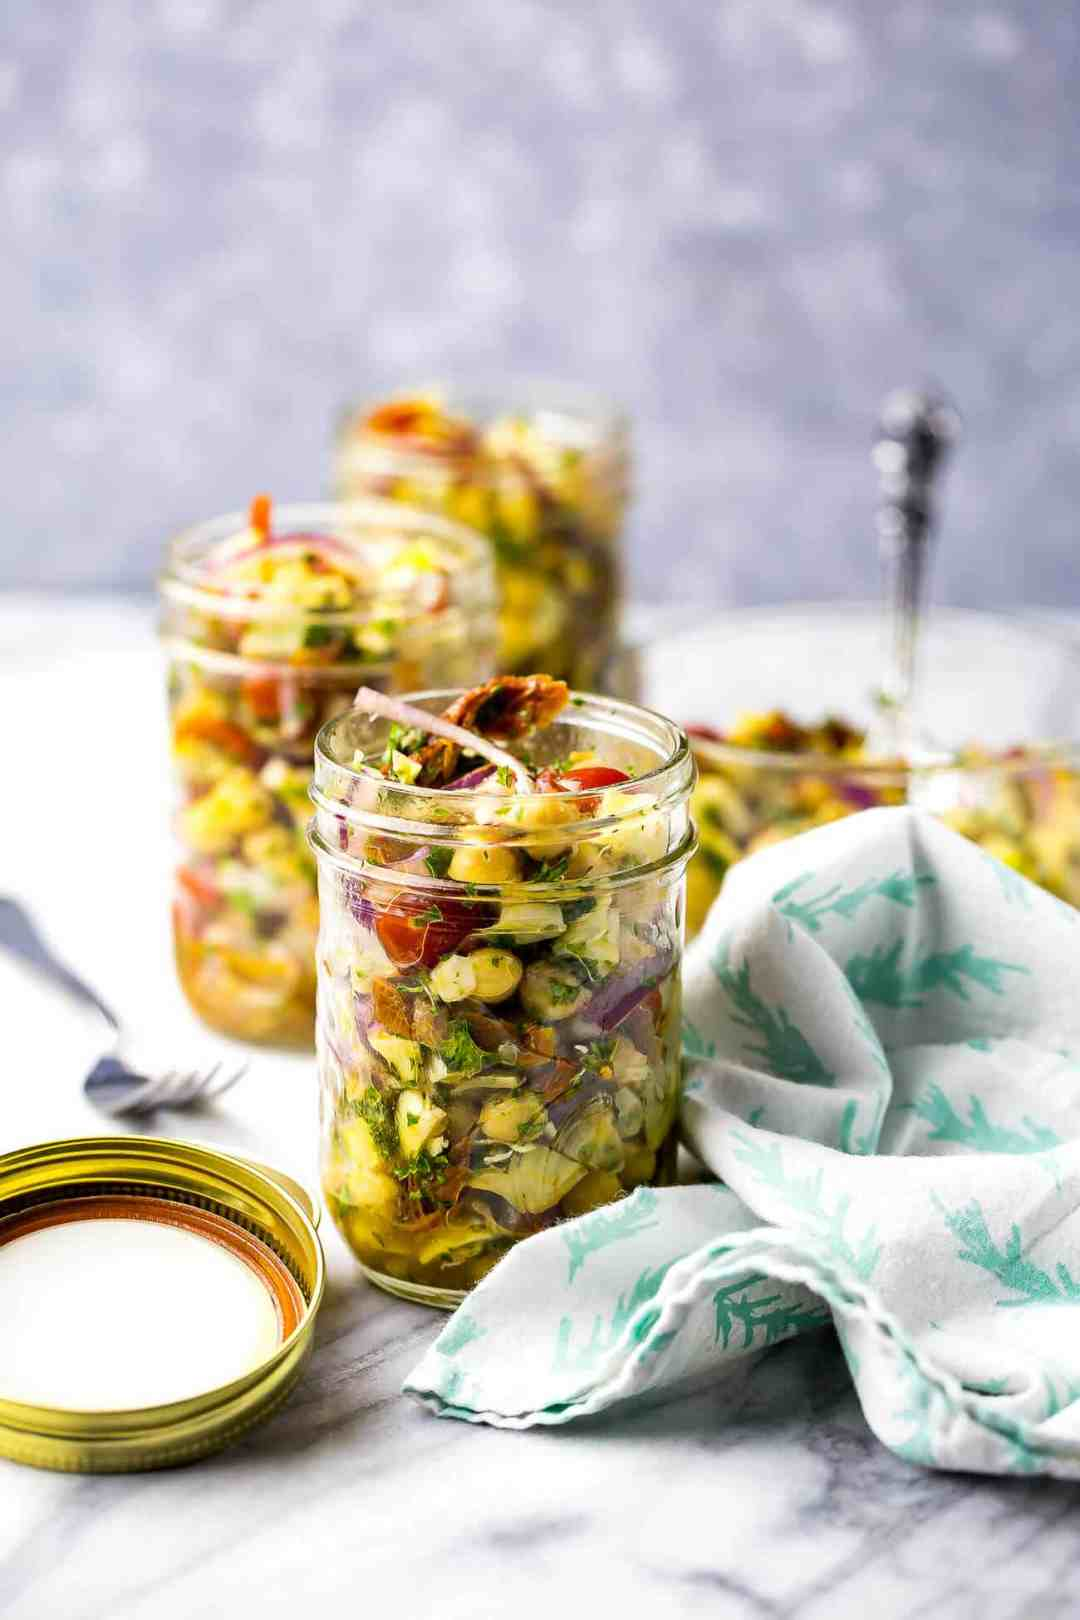 25 Vegetarian Mason Jar Meals to Help You Win at Lunch: Mediterranean Chickpea Salad Jars